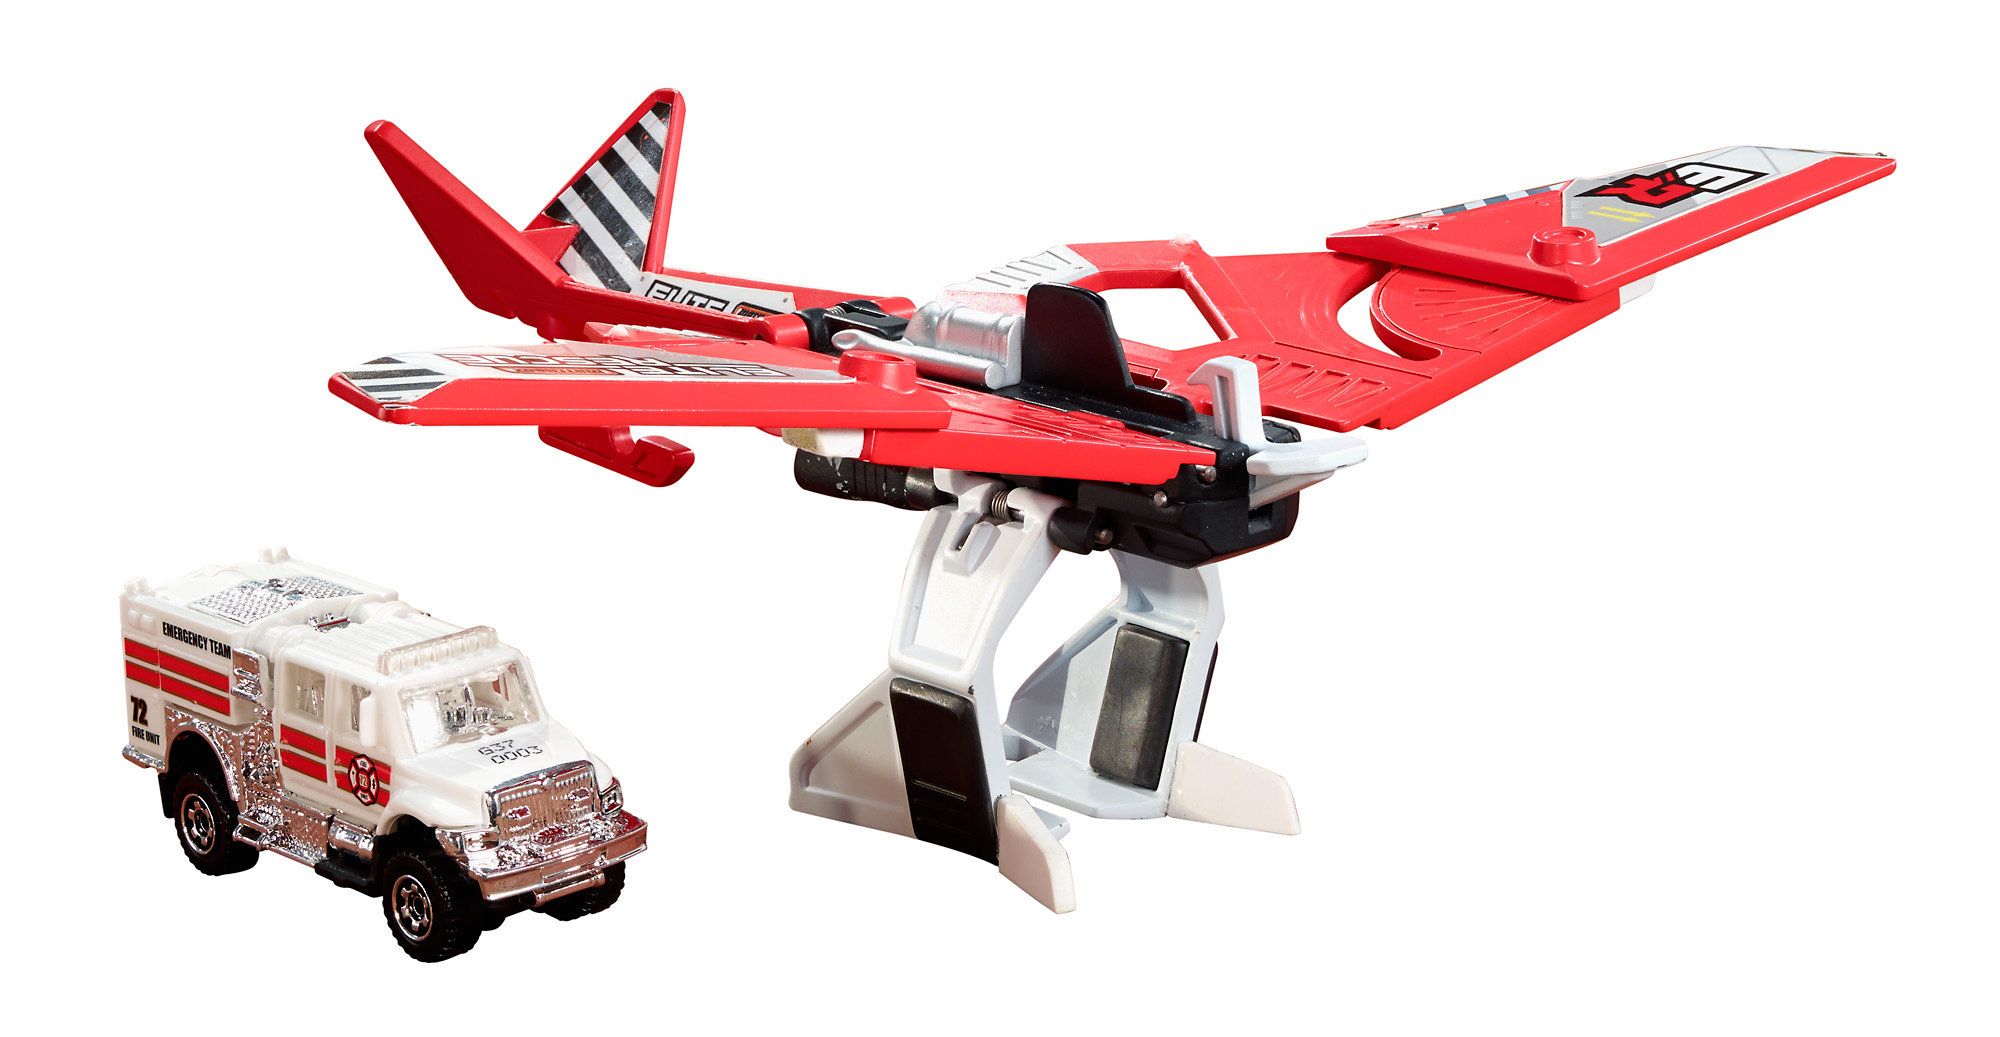 Matchbox Elite Rescue Sky Shifter by Mattel